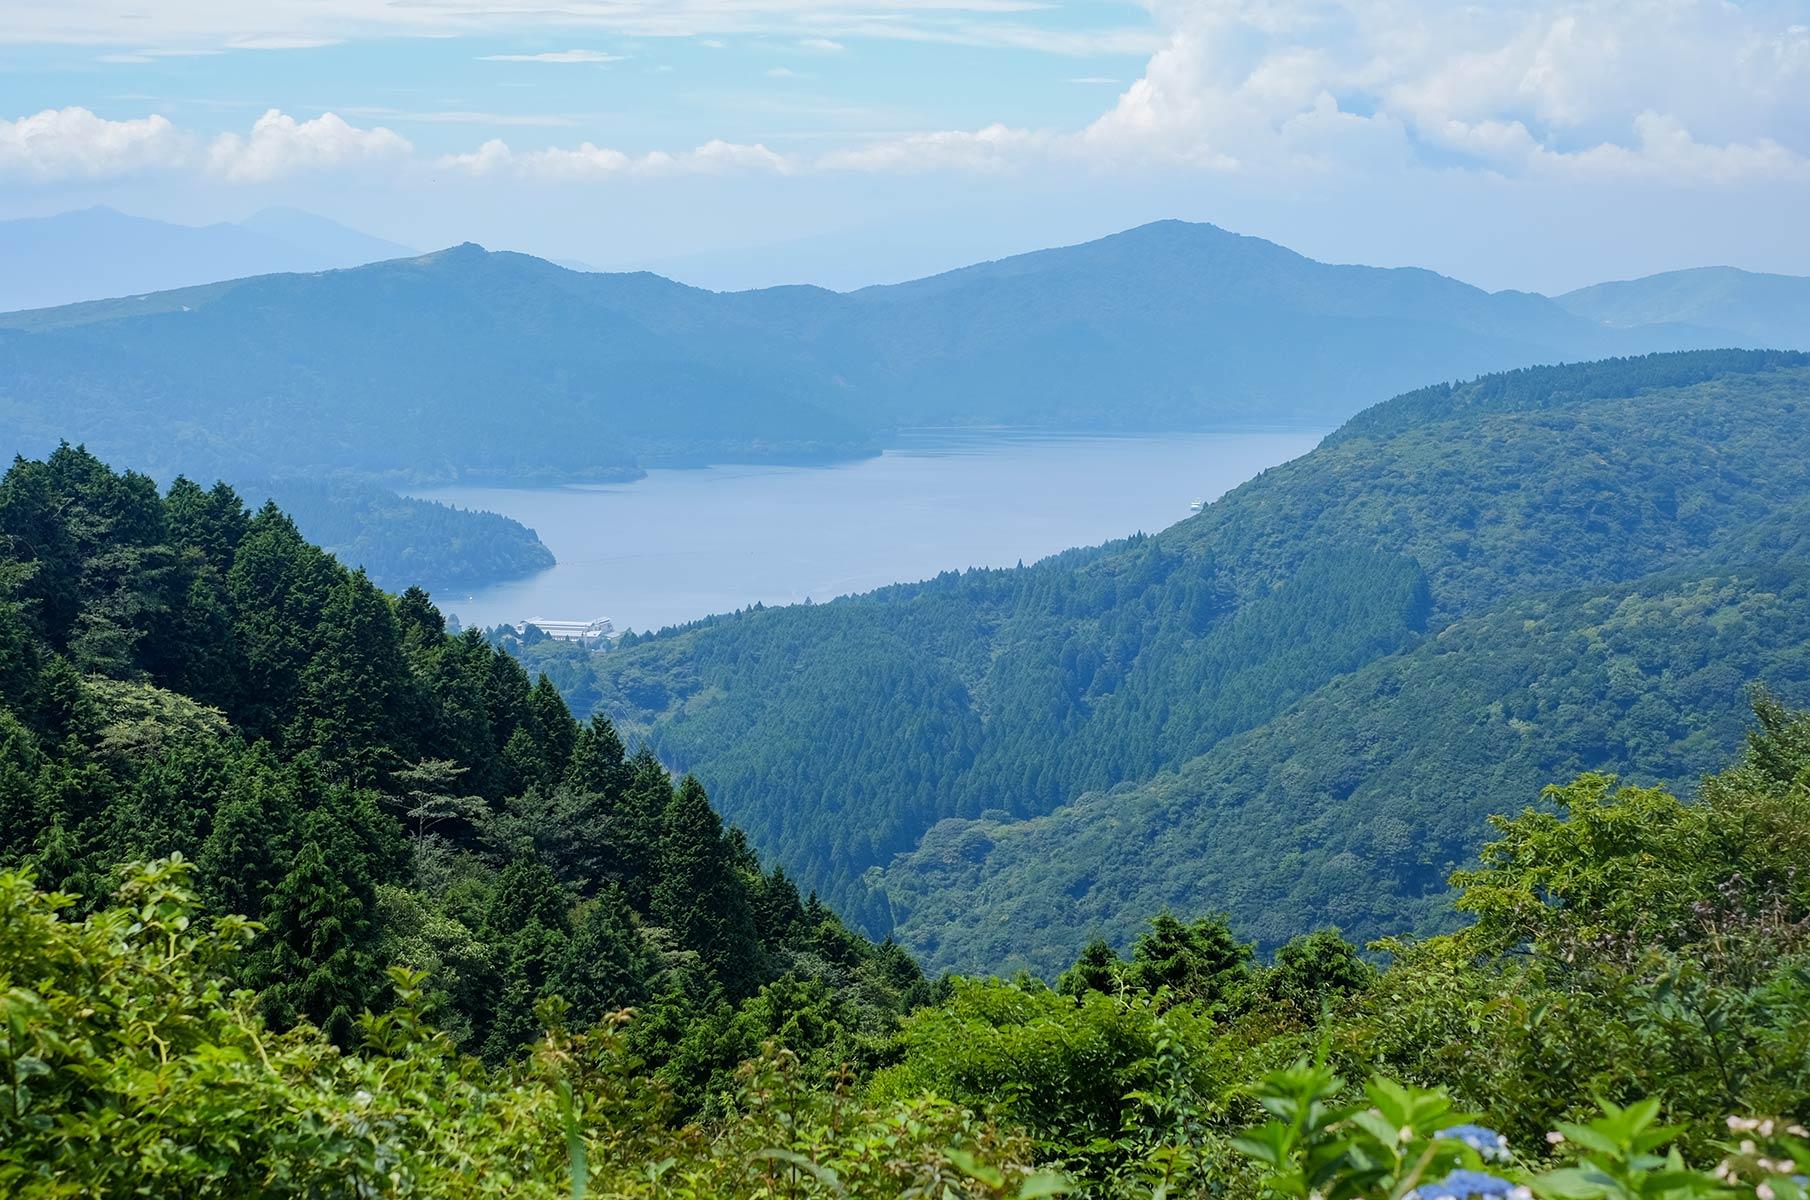 Blick auf den Ashi See in Hakone Gora, Japan